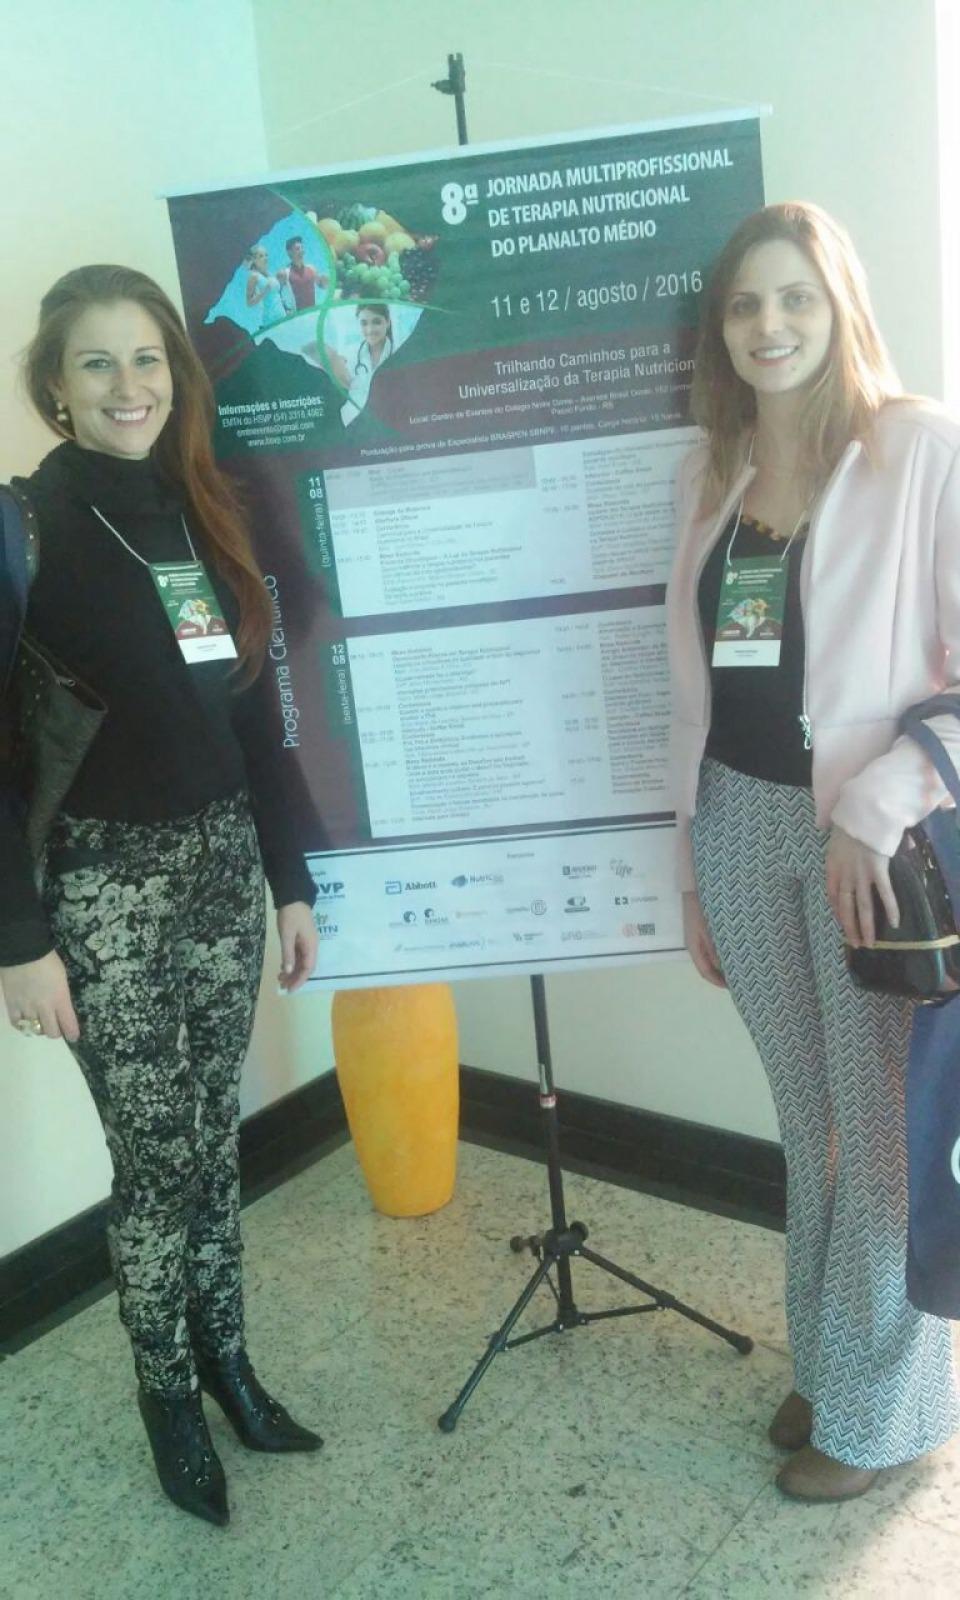 8ª Jornada Multiprofissional de Terapia Nutricional do Planalto Médio